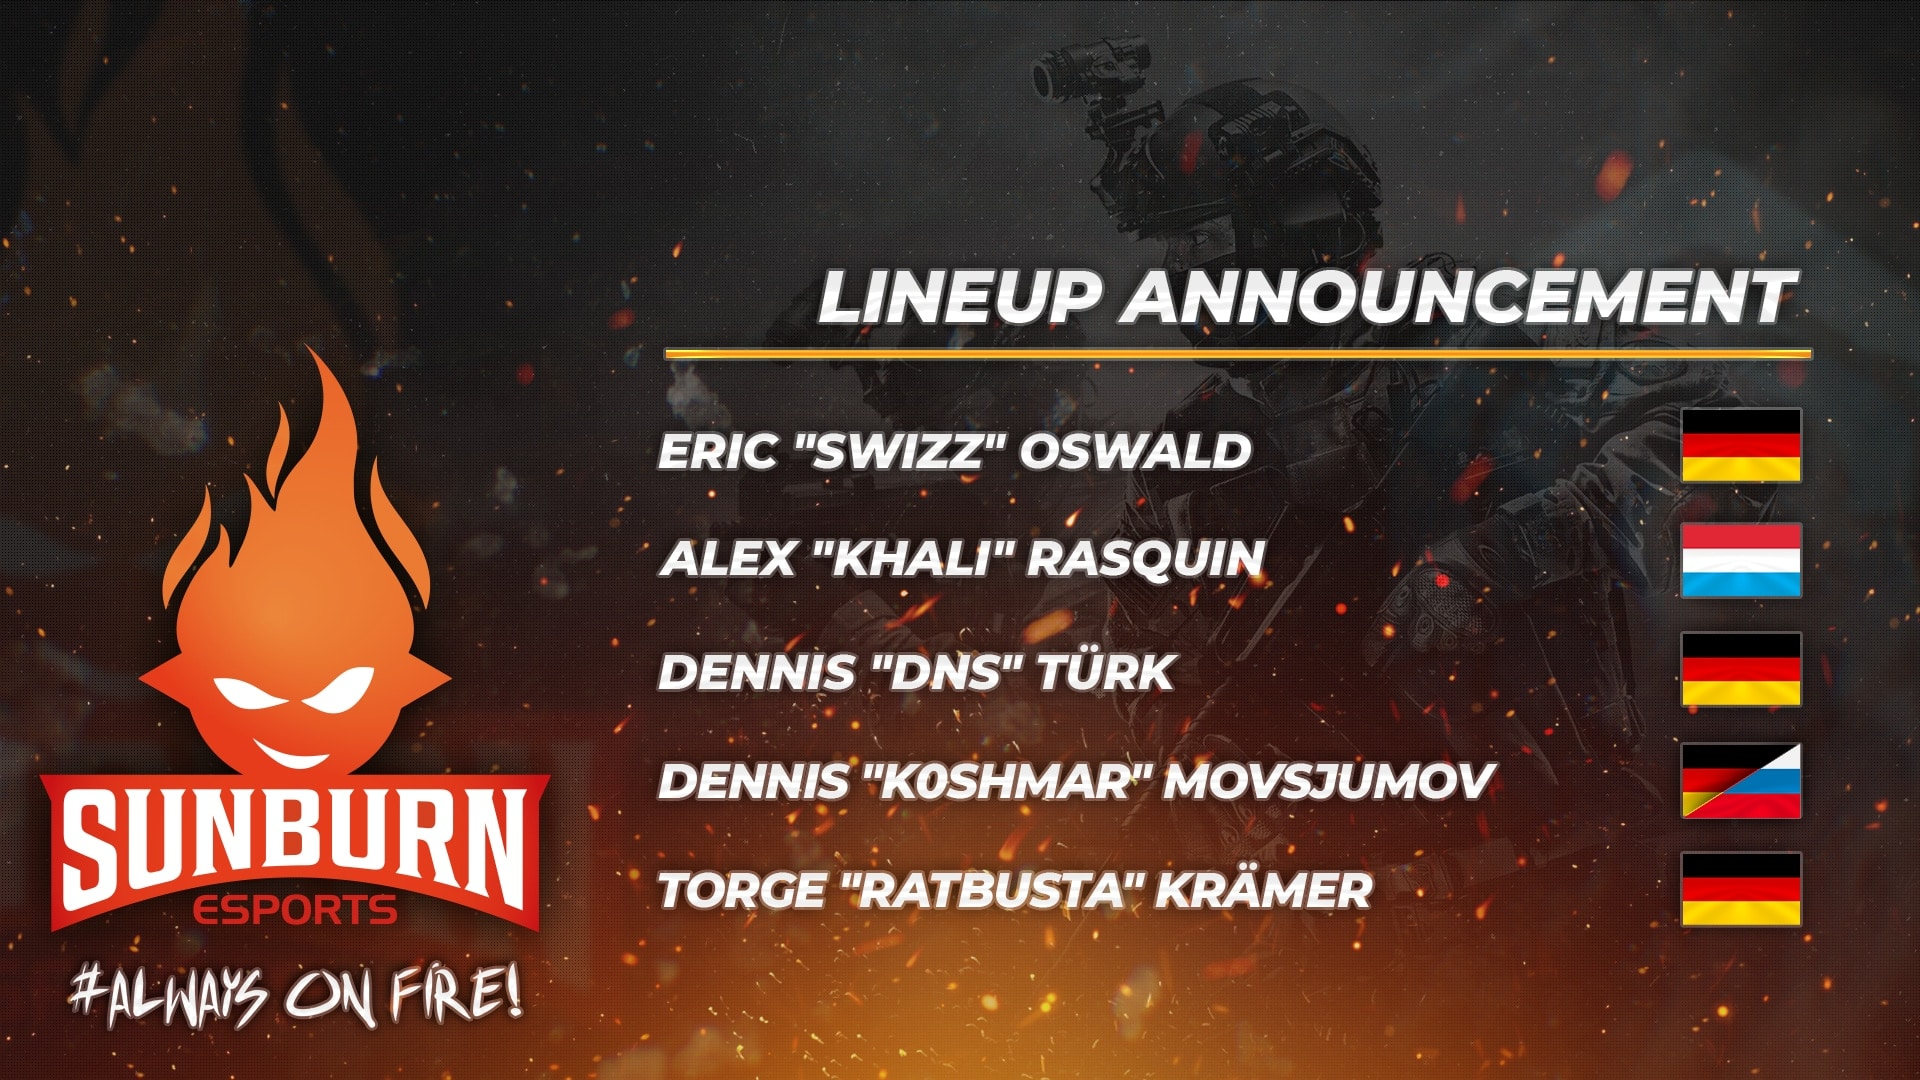 Lineup Announcement SUNBURN-CS:GO 04.01.2020